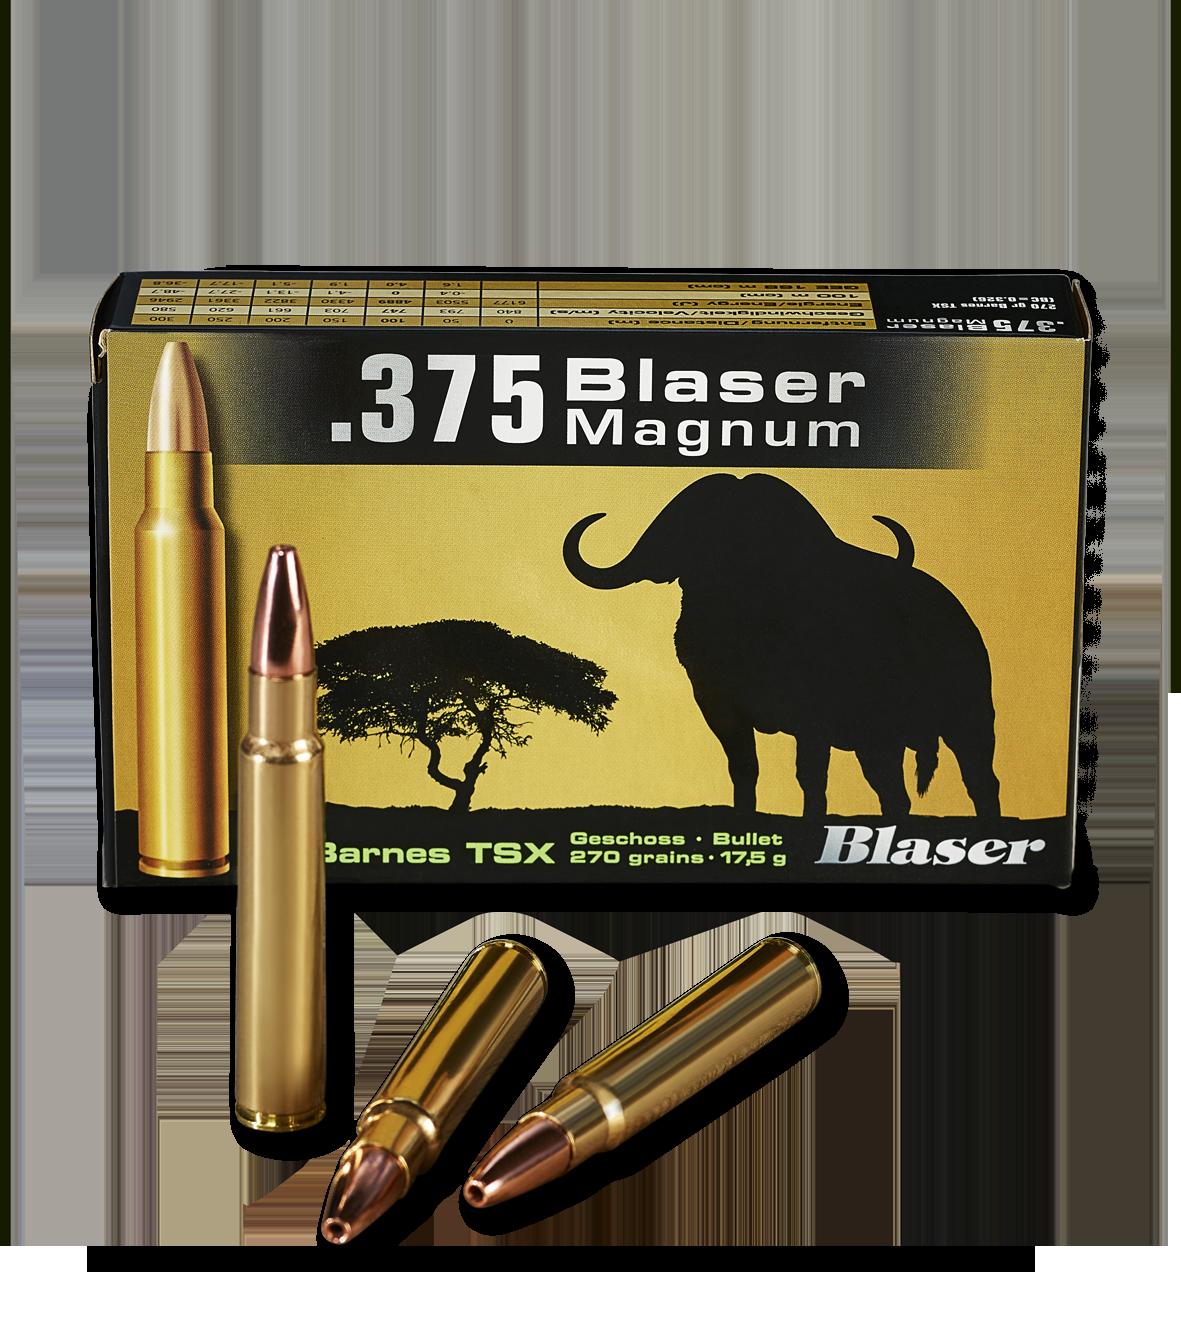 Blaser Magnum  A new generation of hunting bullets  - Blaser Jagdwaffen